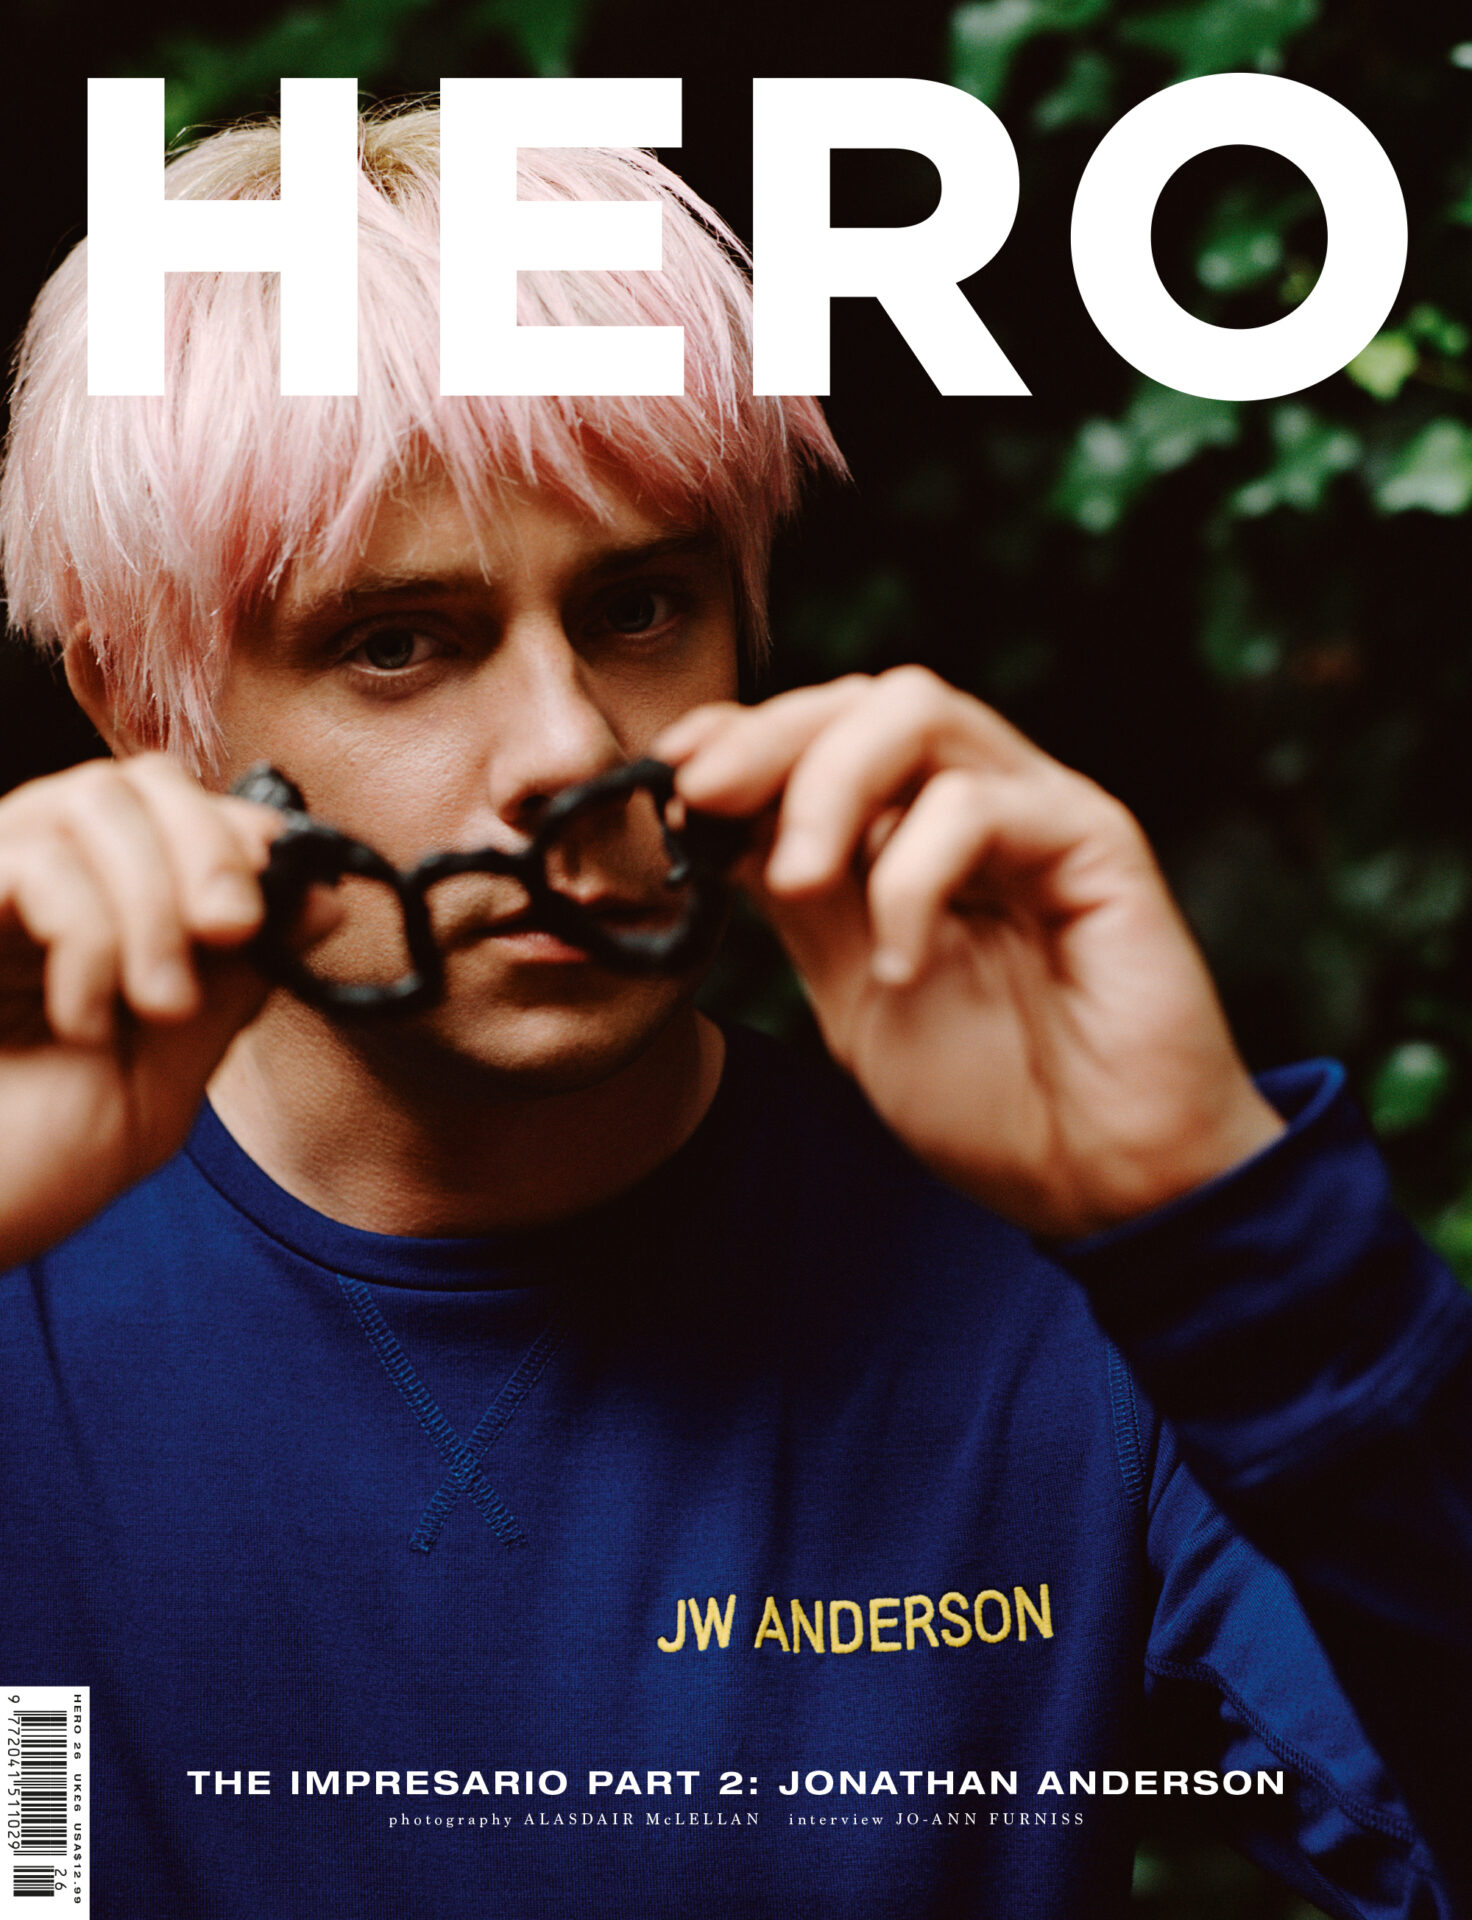 Back to School : HERO 26: BACK TO SCHOOL –out now, Alasdair McLellan shoots 'The Impresario Part 2: Jonathan Anderson'